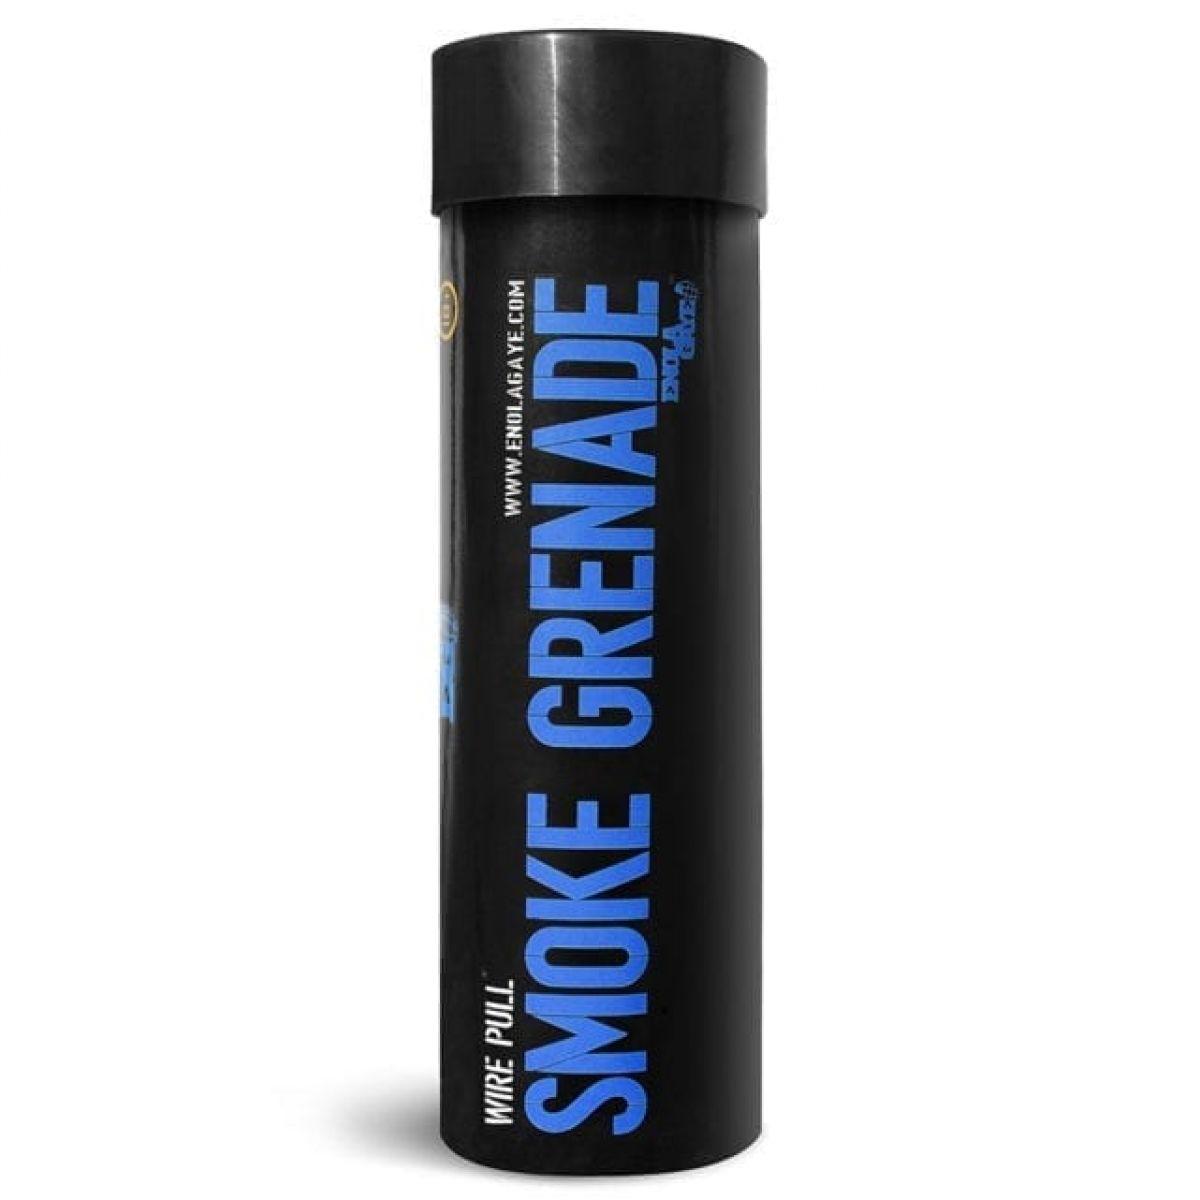 WP40-BLUE enola smoke grenade